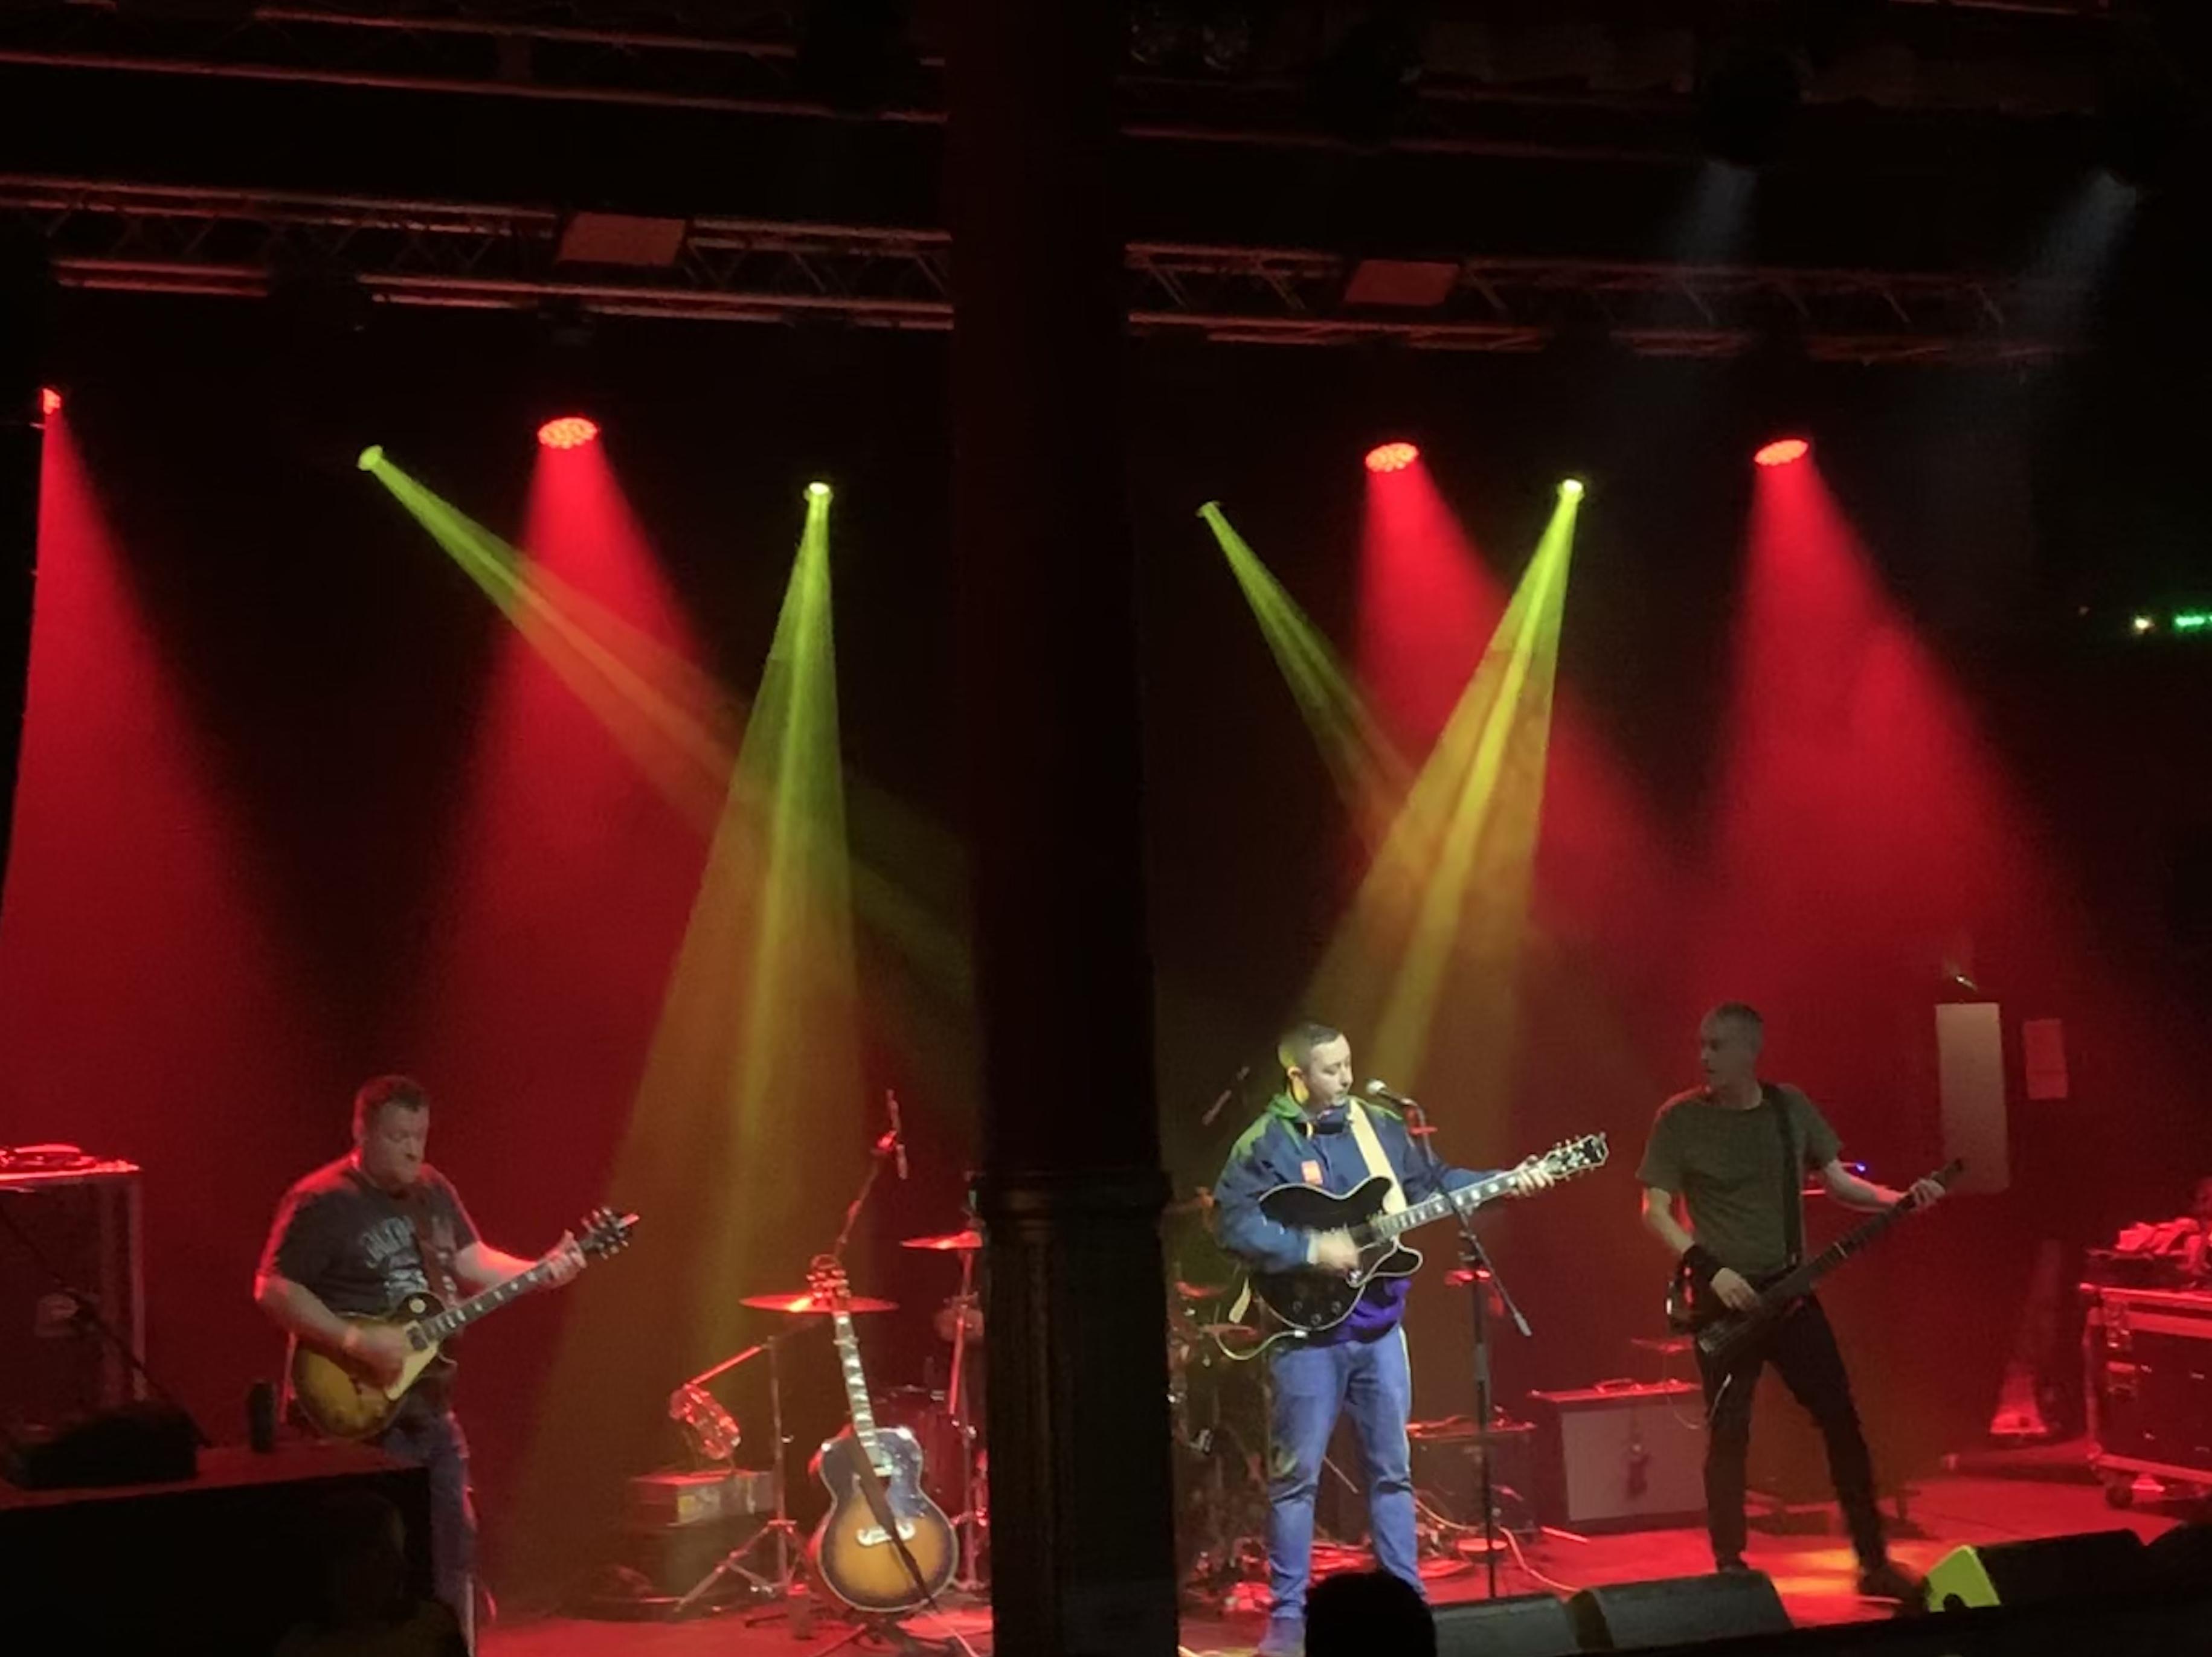 Alan Triggs @ Arts Club, Liverpool 13/09/2019